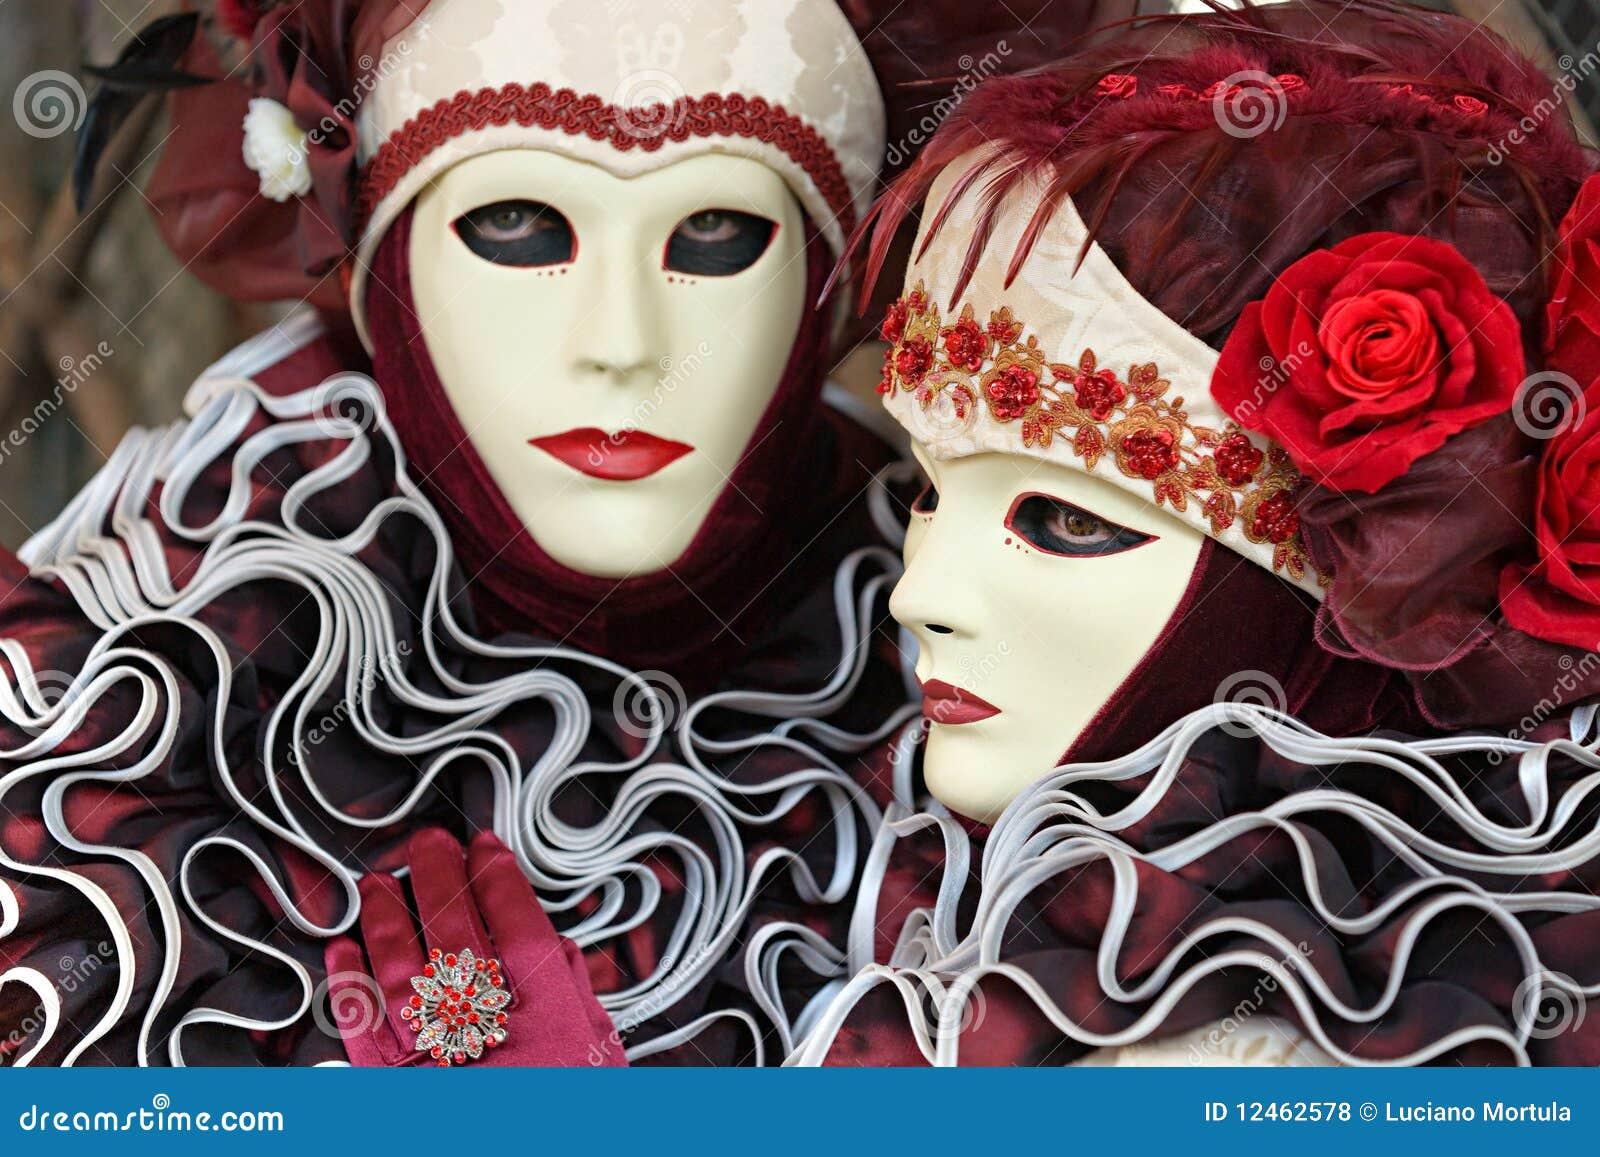 Venice masks carnival focus on the right mask stock - Mascaras de carnaval de venecia ...